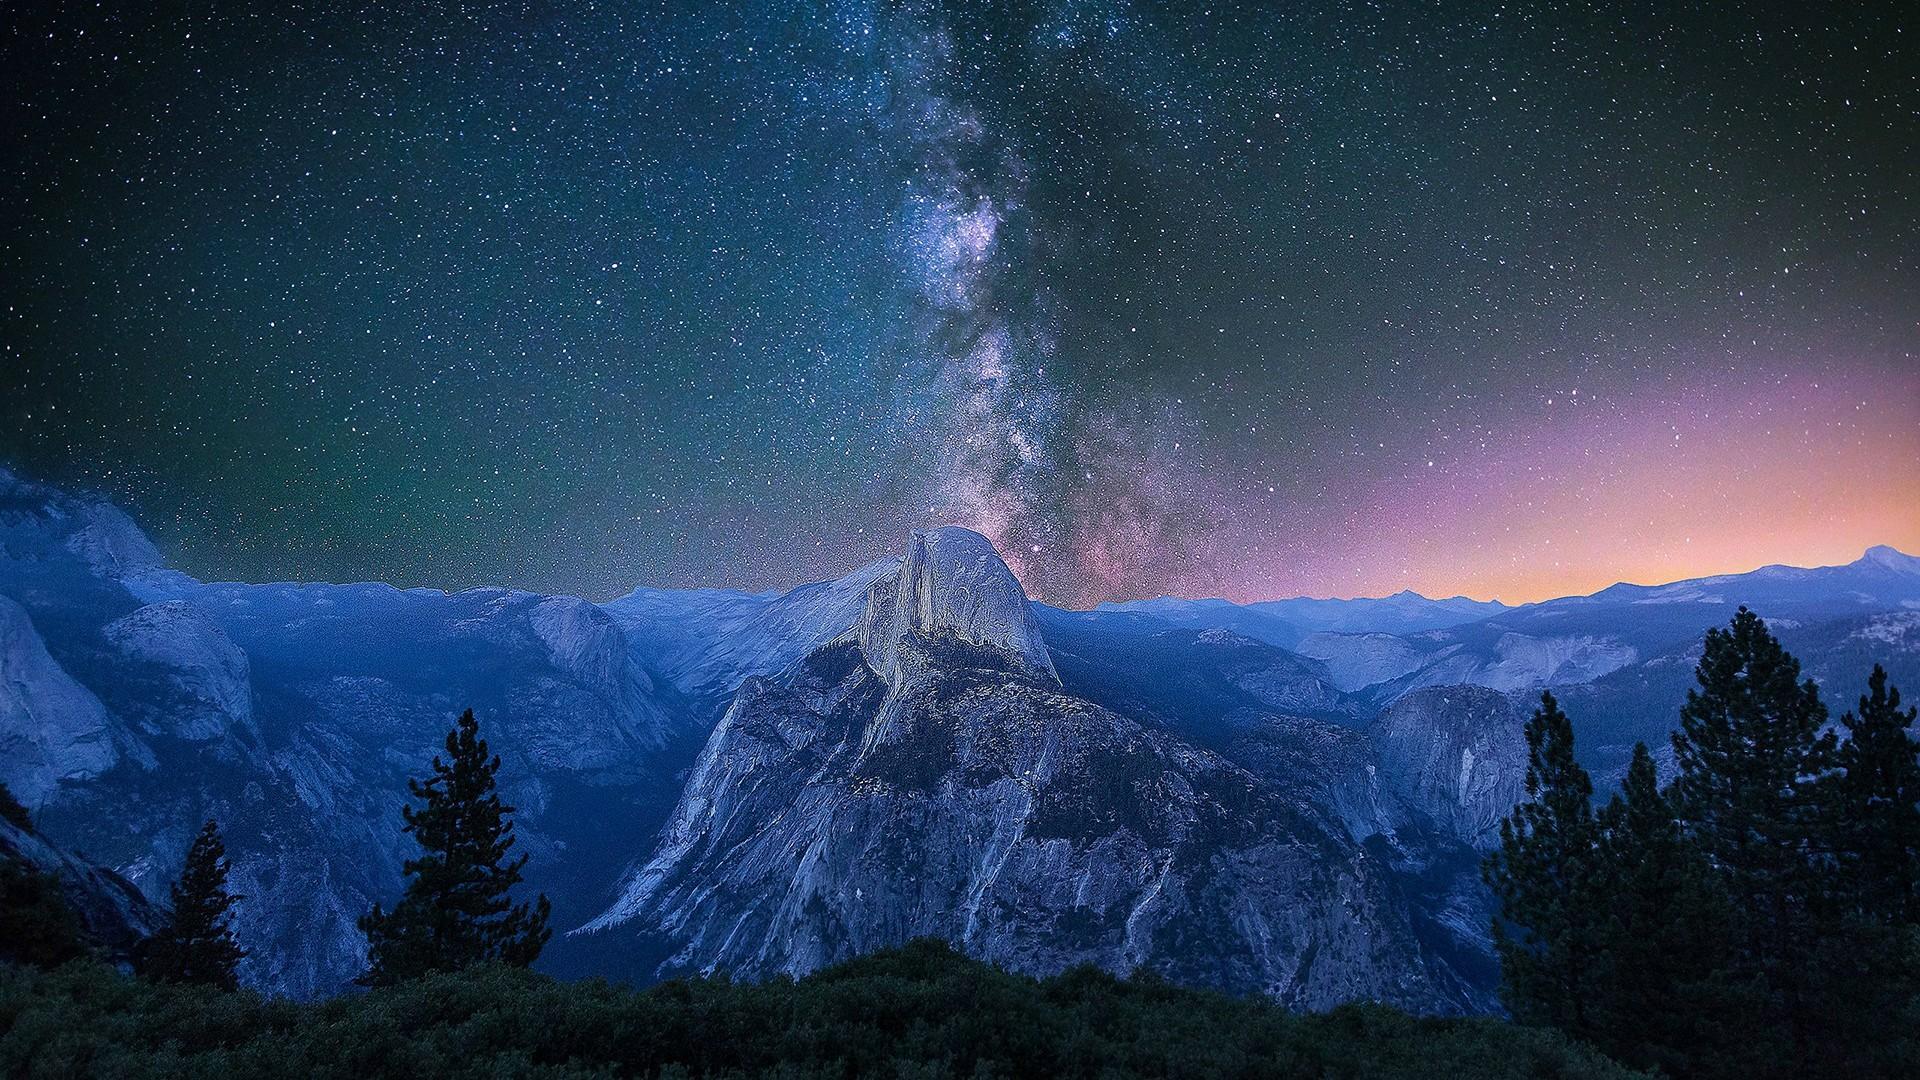 Milky Way over Yosemite wallpaper